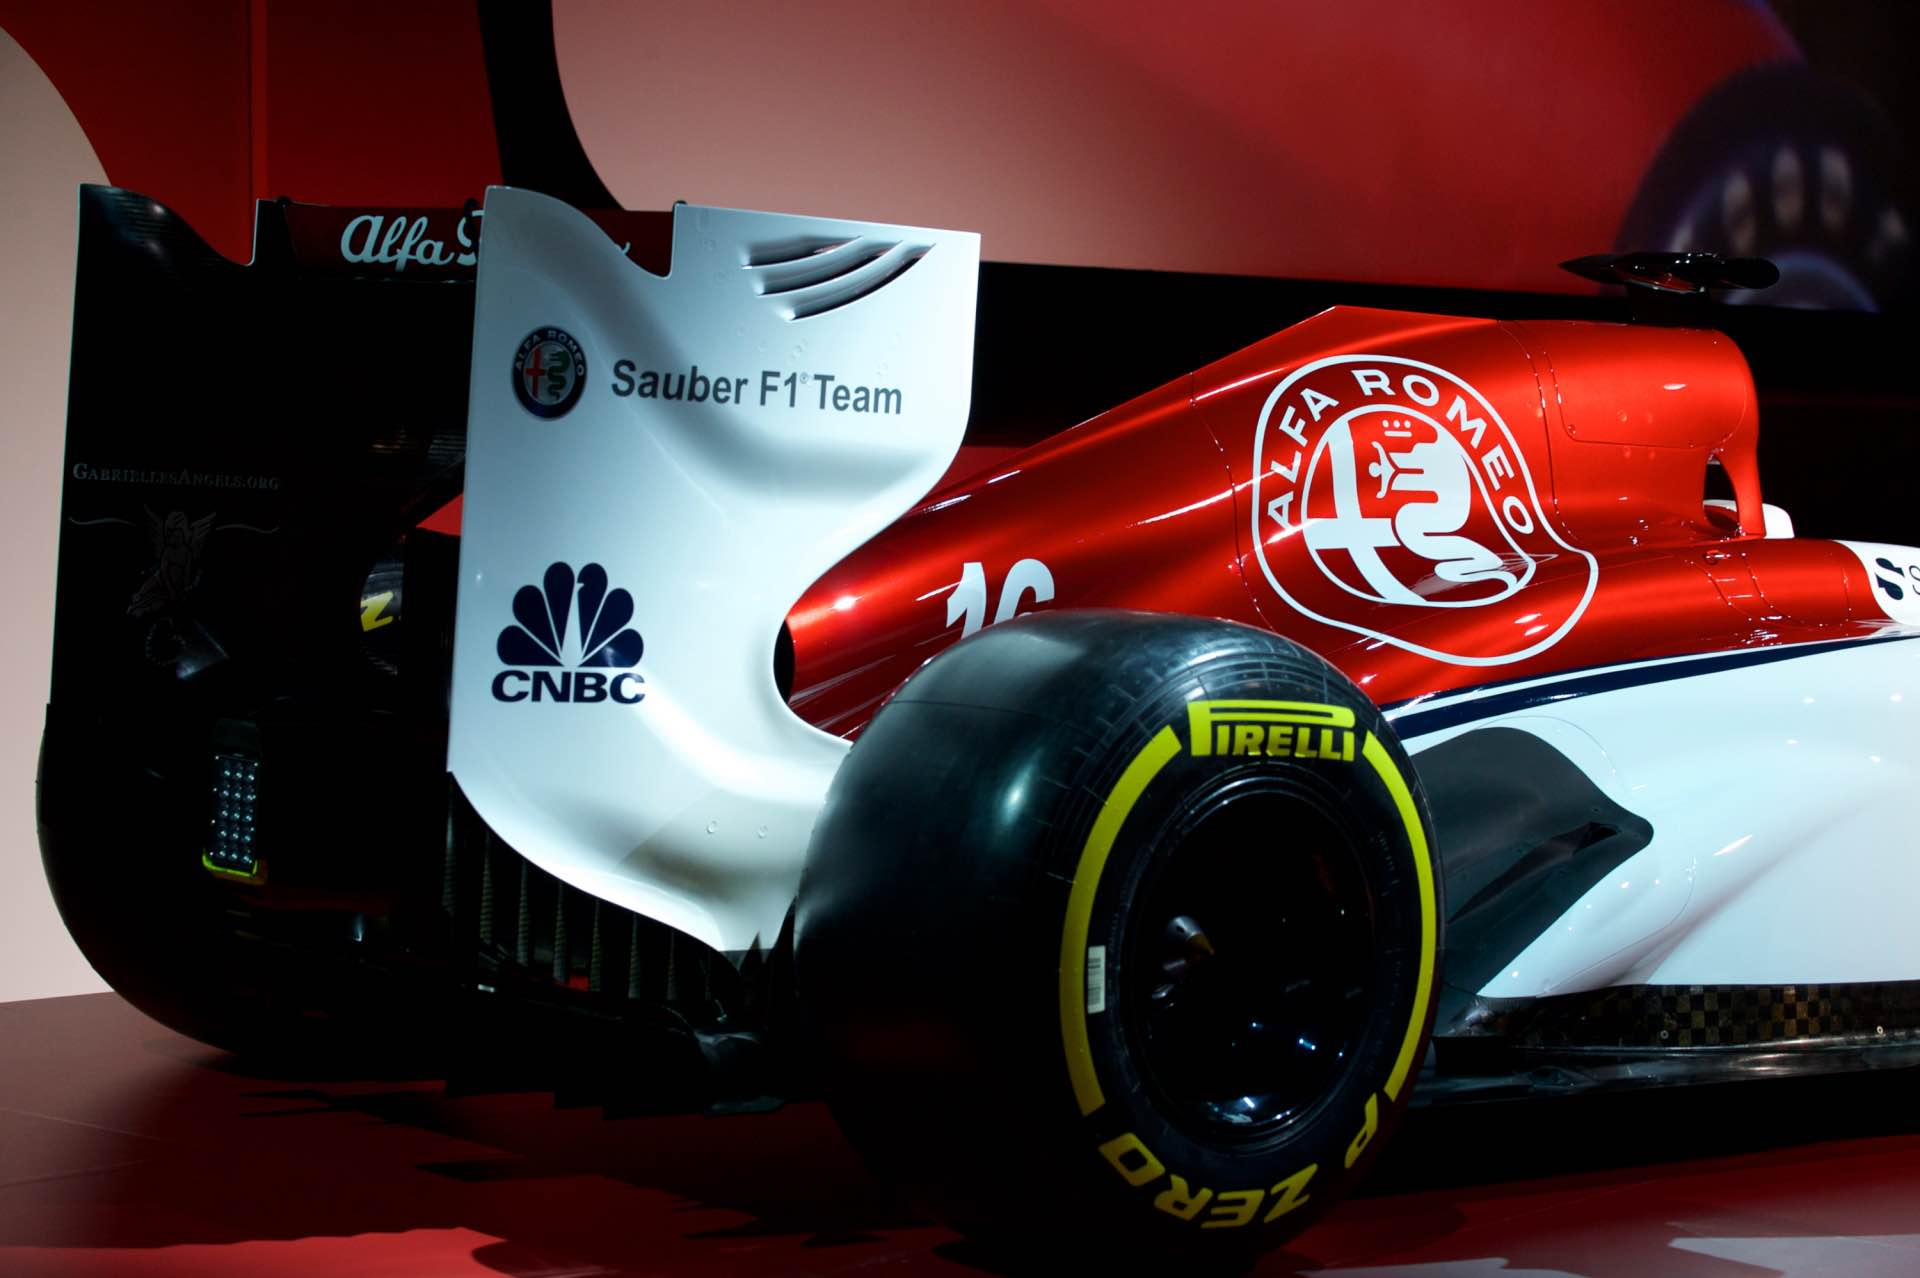 171202_Alfa-Romeo_Team-F1_08